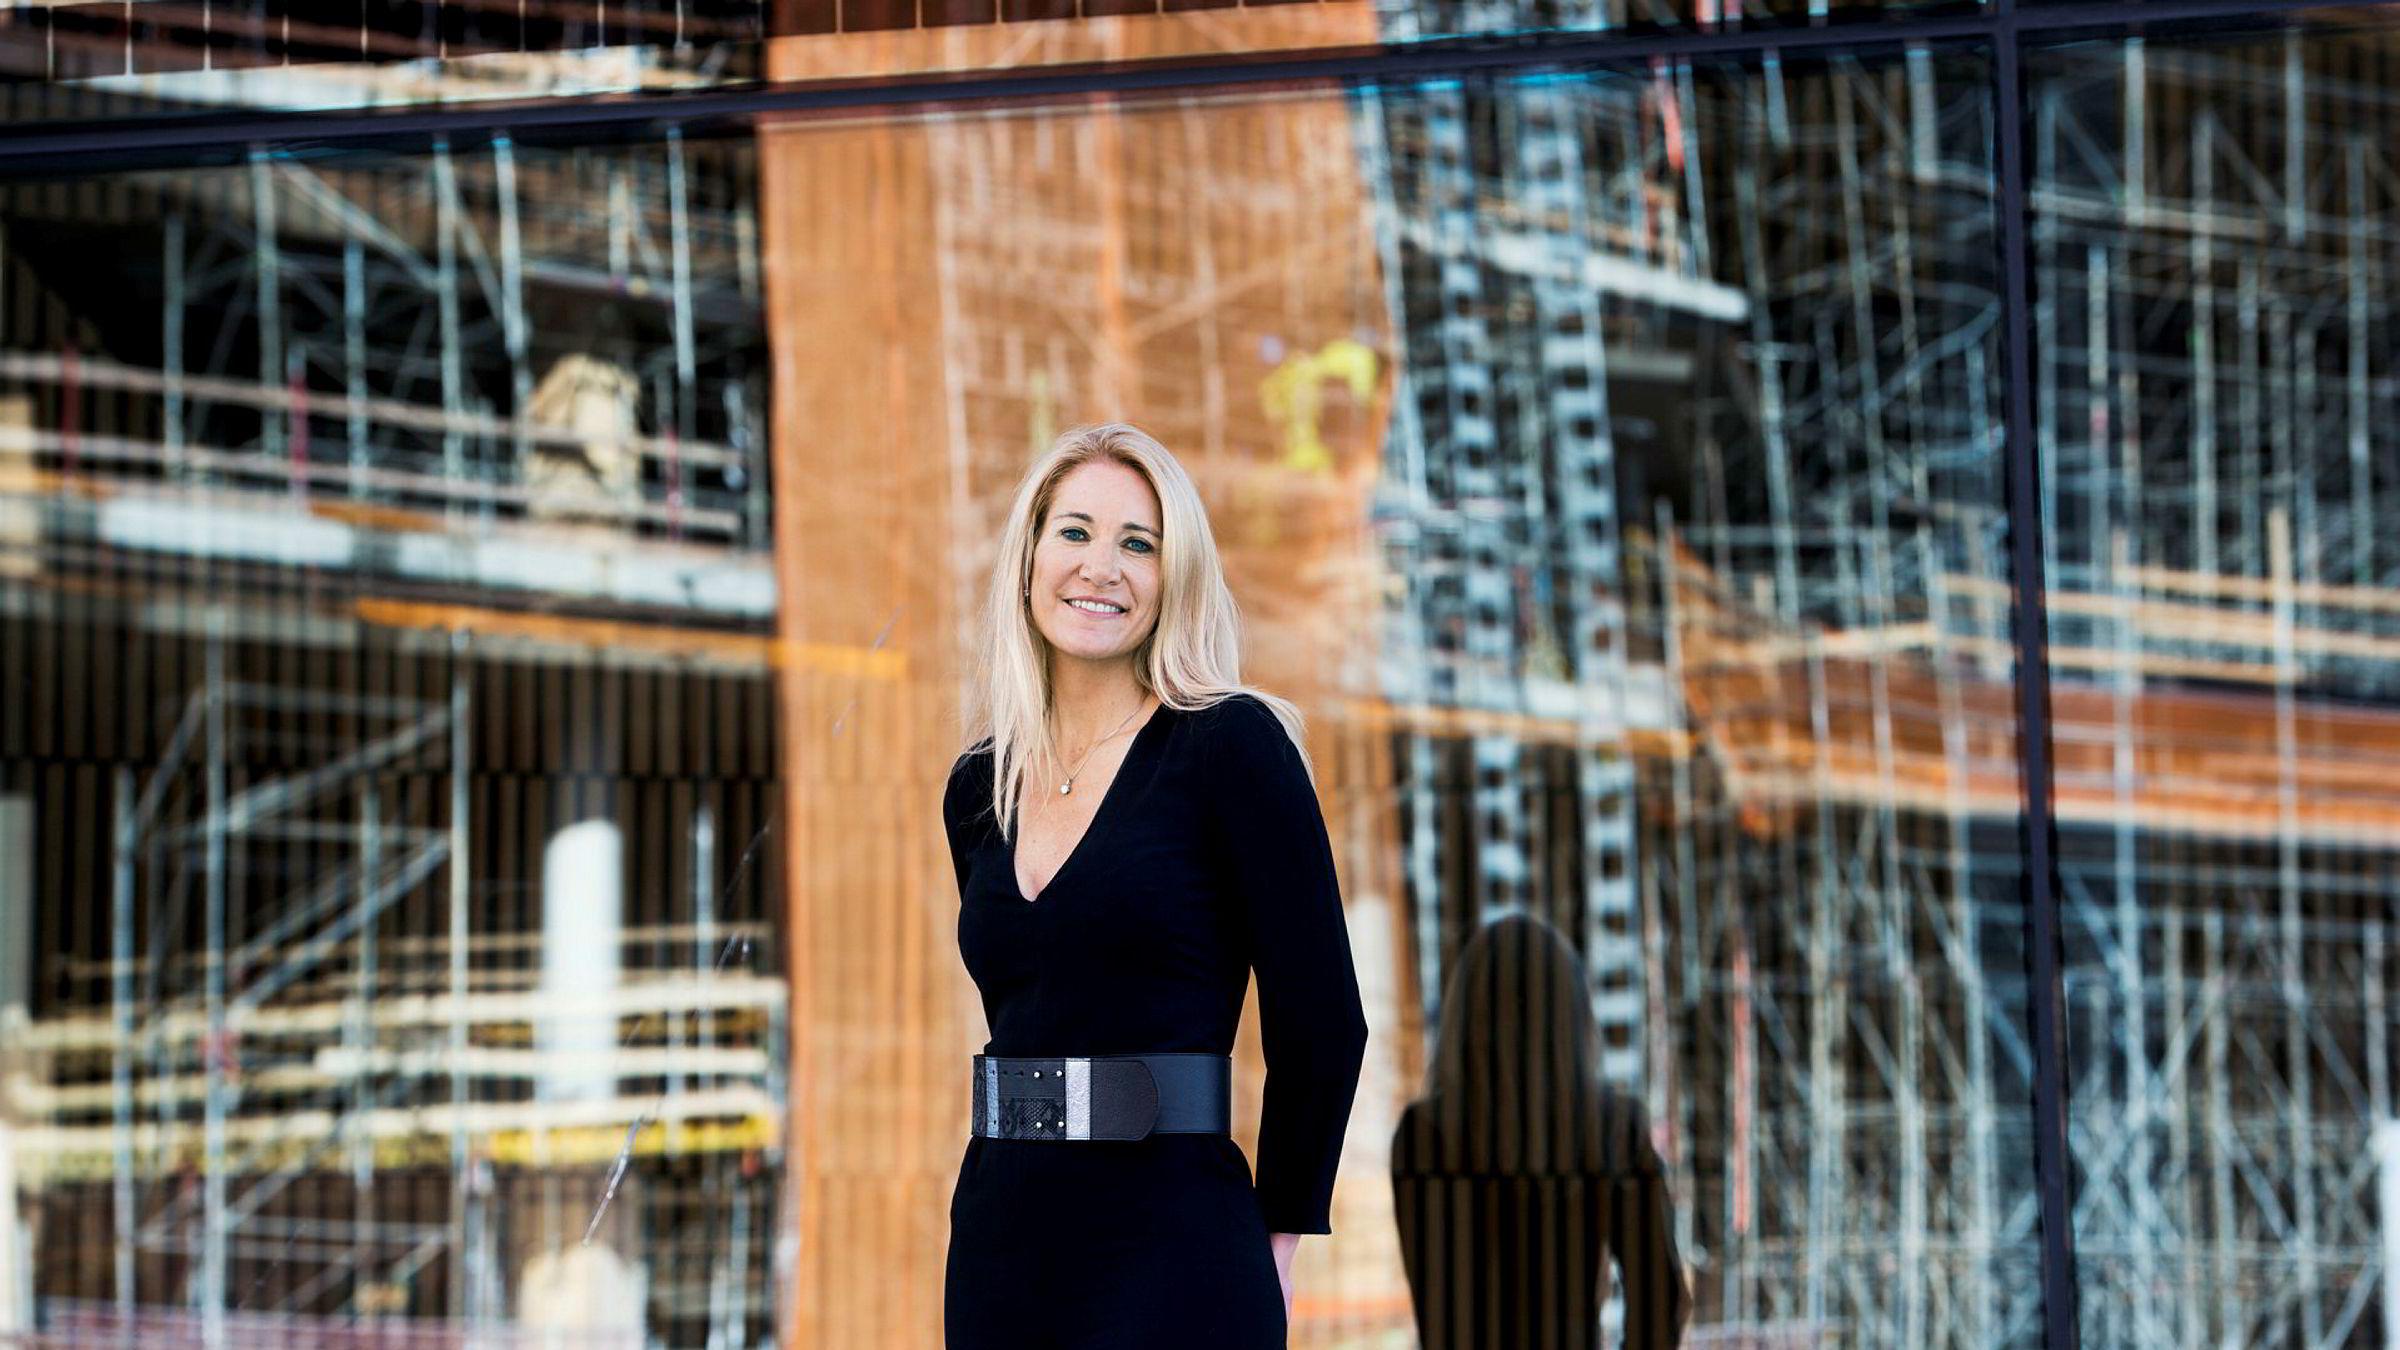 Julie Brodtkorb skal lede Kringkastingsrådet de tre neste årene.